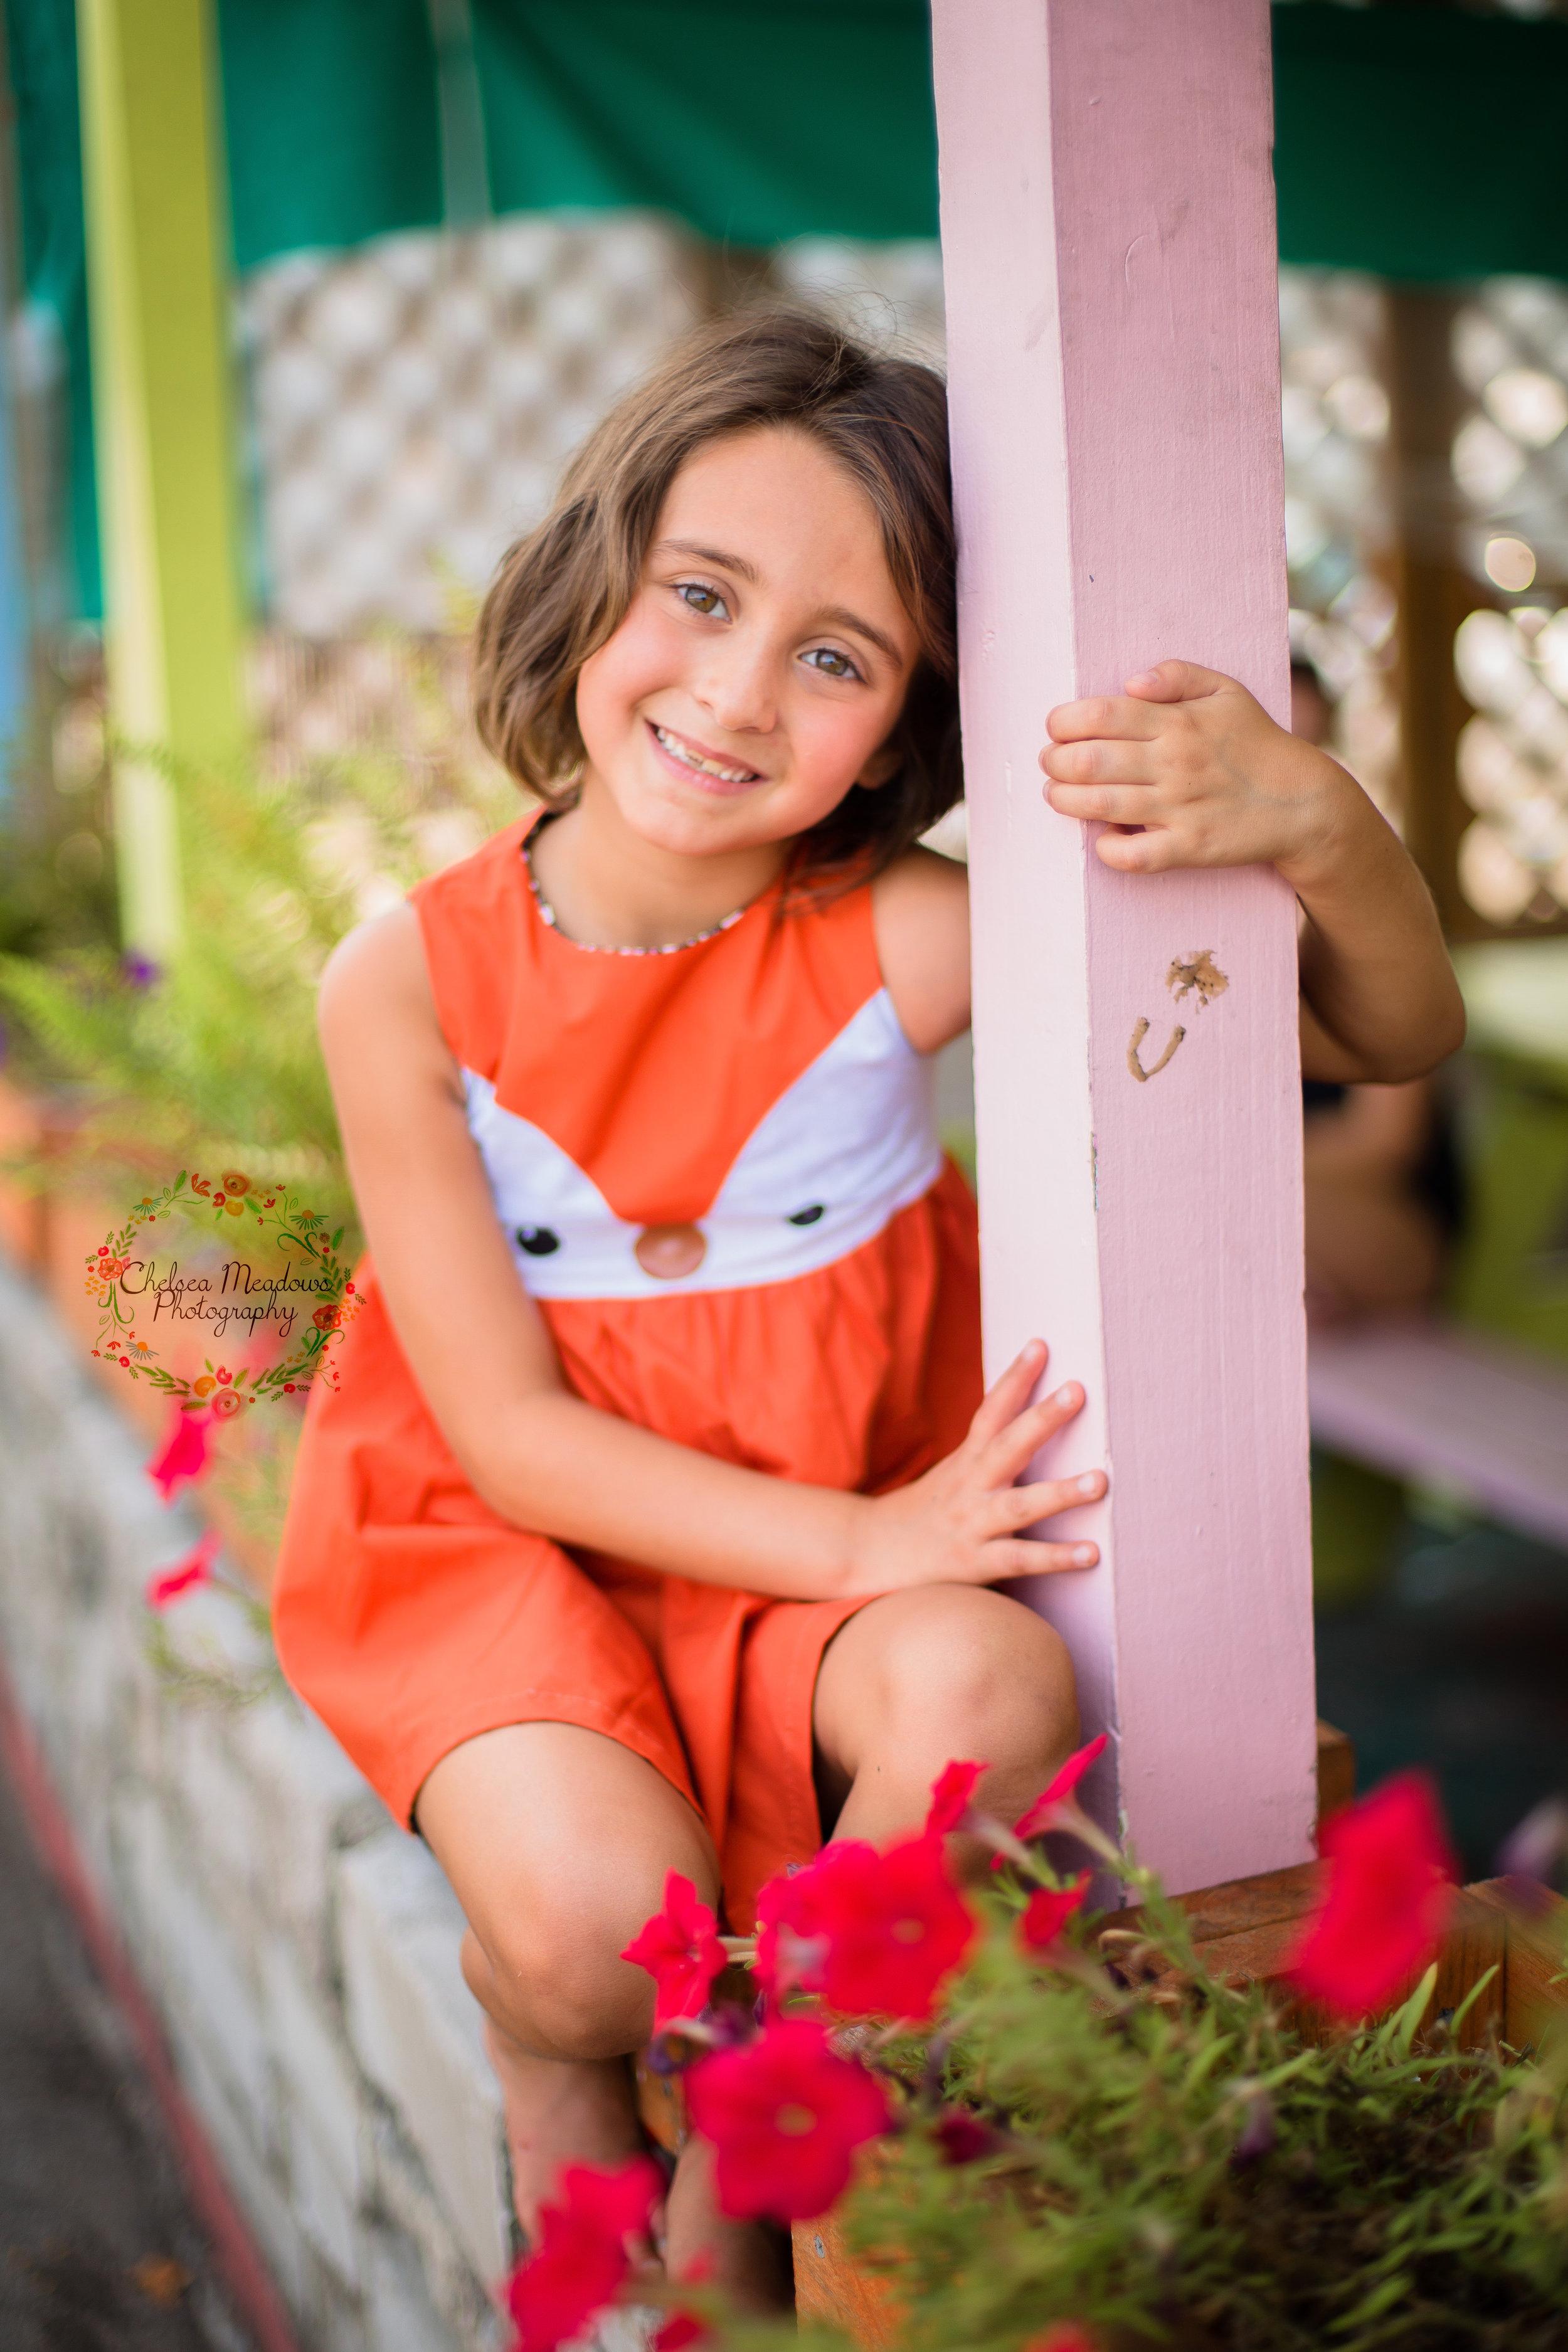 Izzy Family Photoshoot - Nashville Family Photographer - Chelsea Meadows Photography (36).jpg